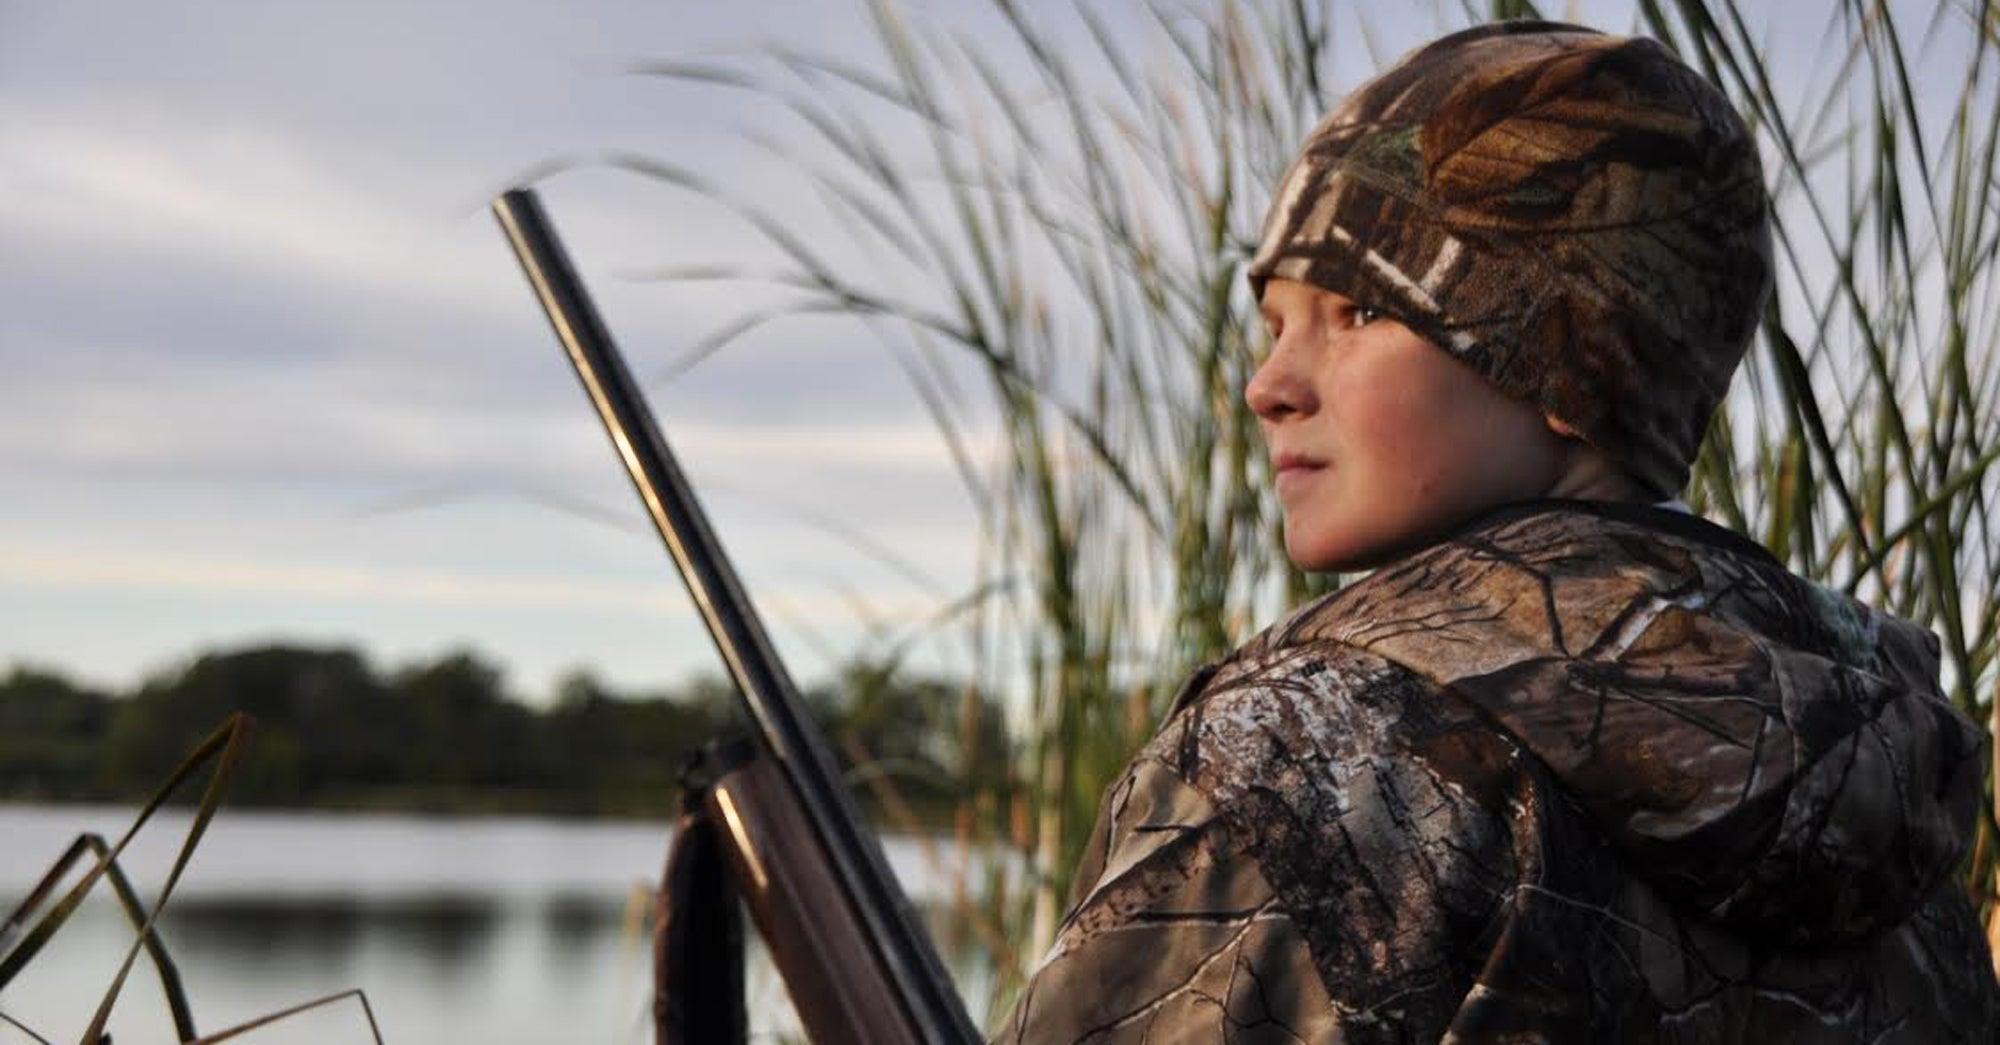 More Hunting, Fishing on National Wildlife Refuges?